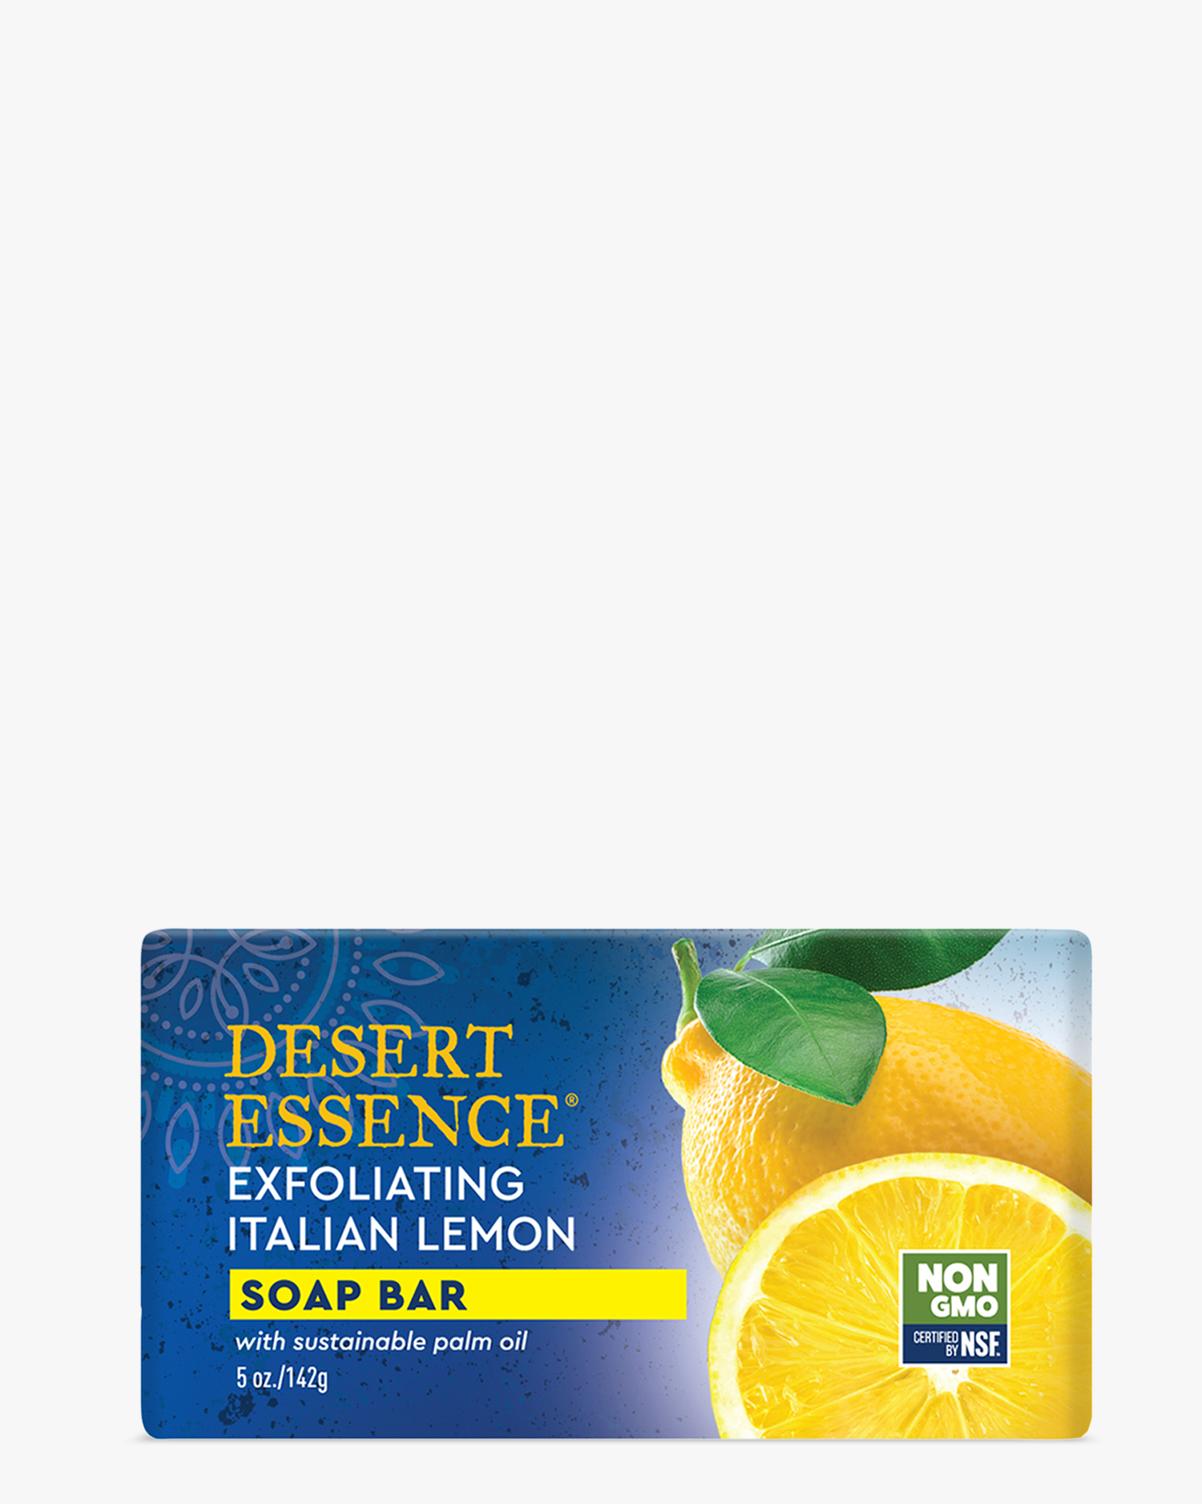 Desert Essence coupon: Desert Essence Exfoliating Italian Lemon Soap Bar, 5 oz. | Vegan | Gluten-Free